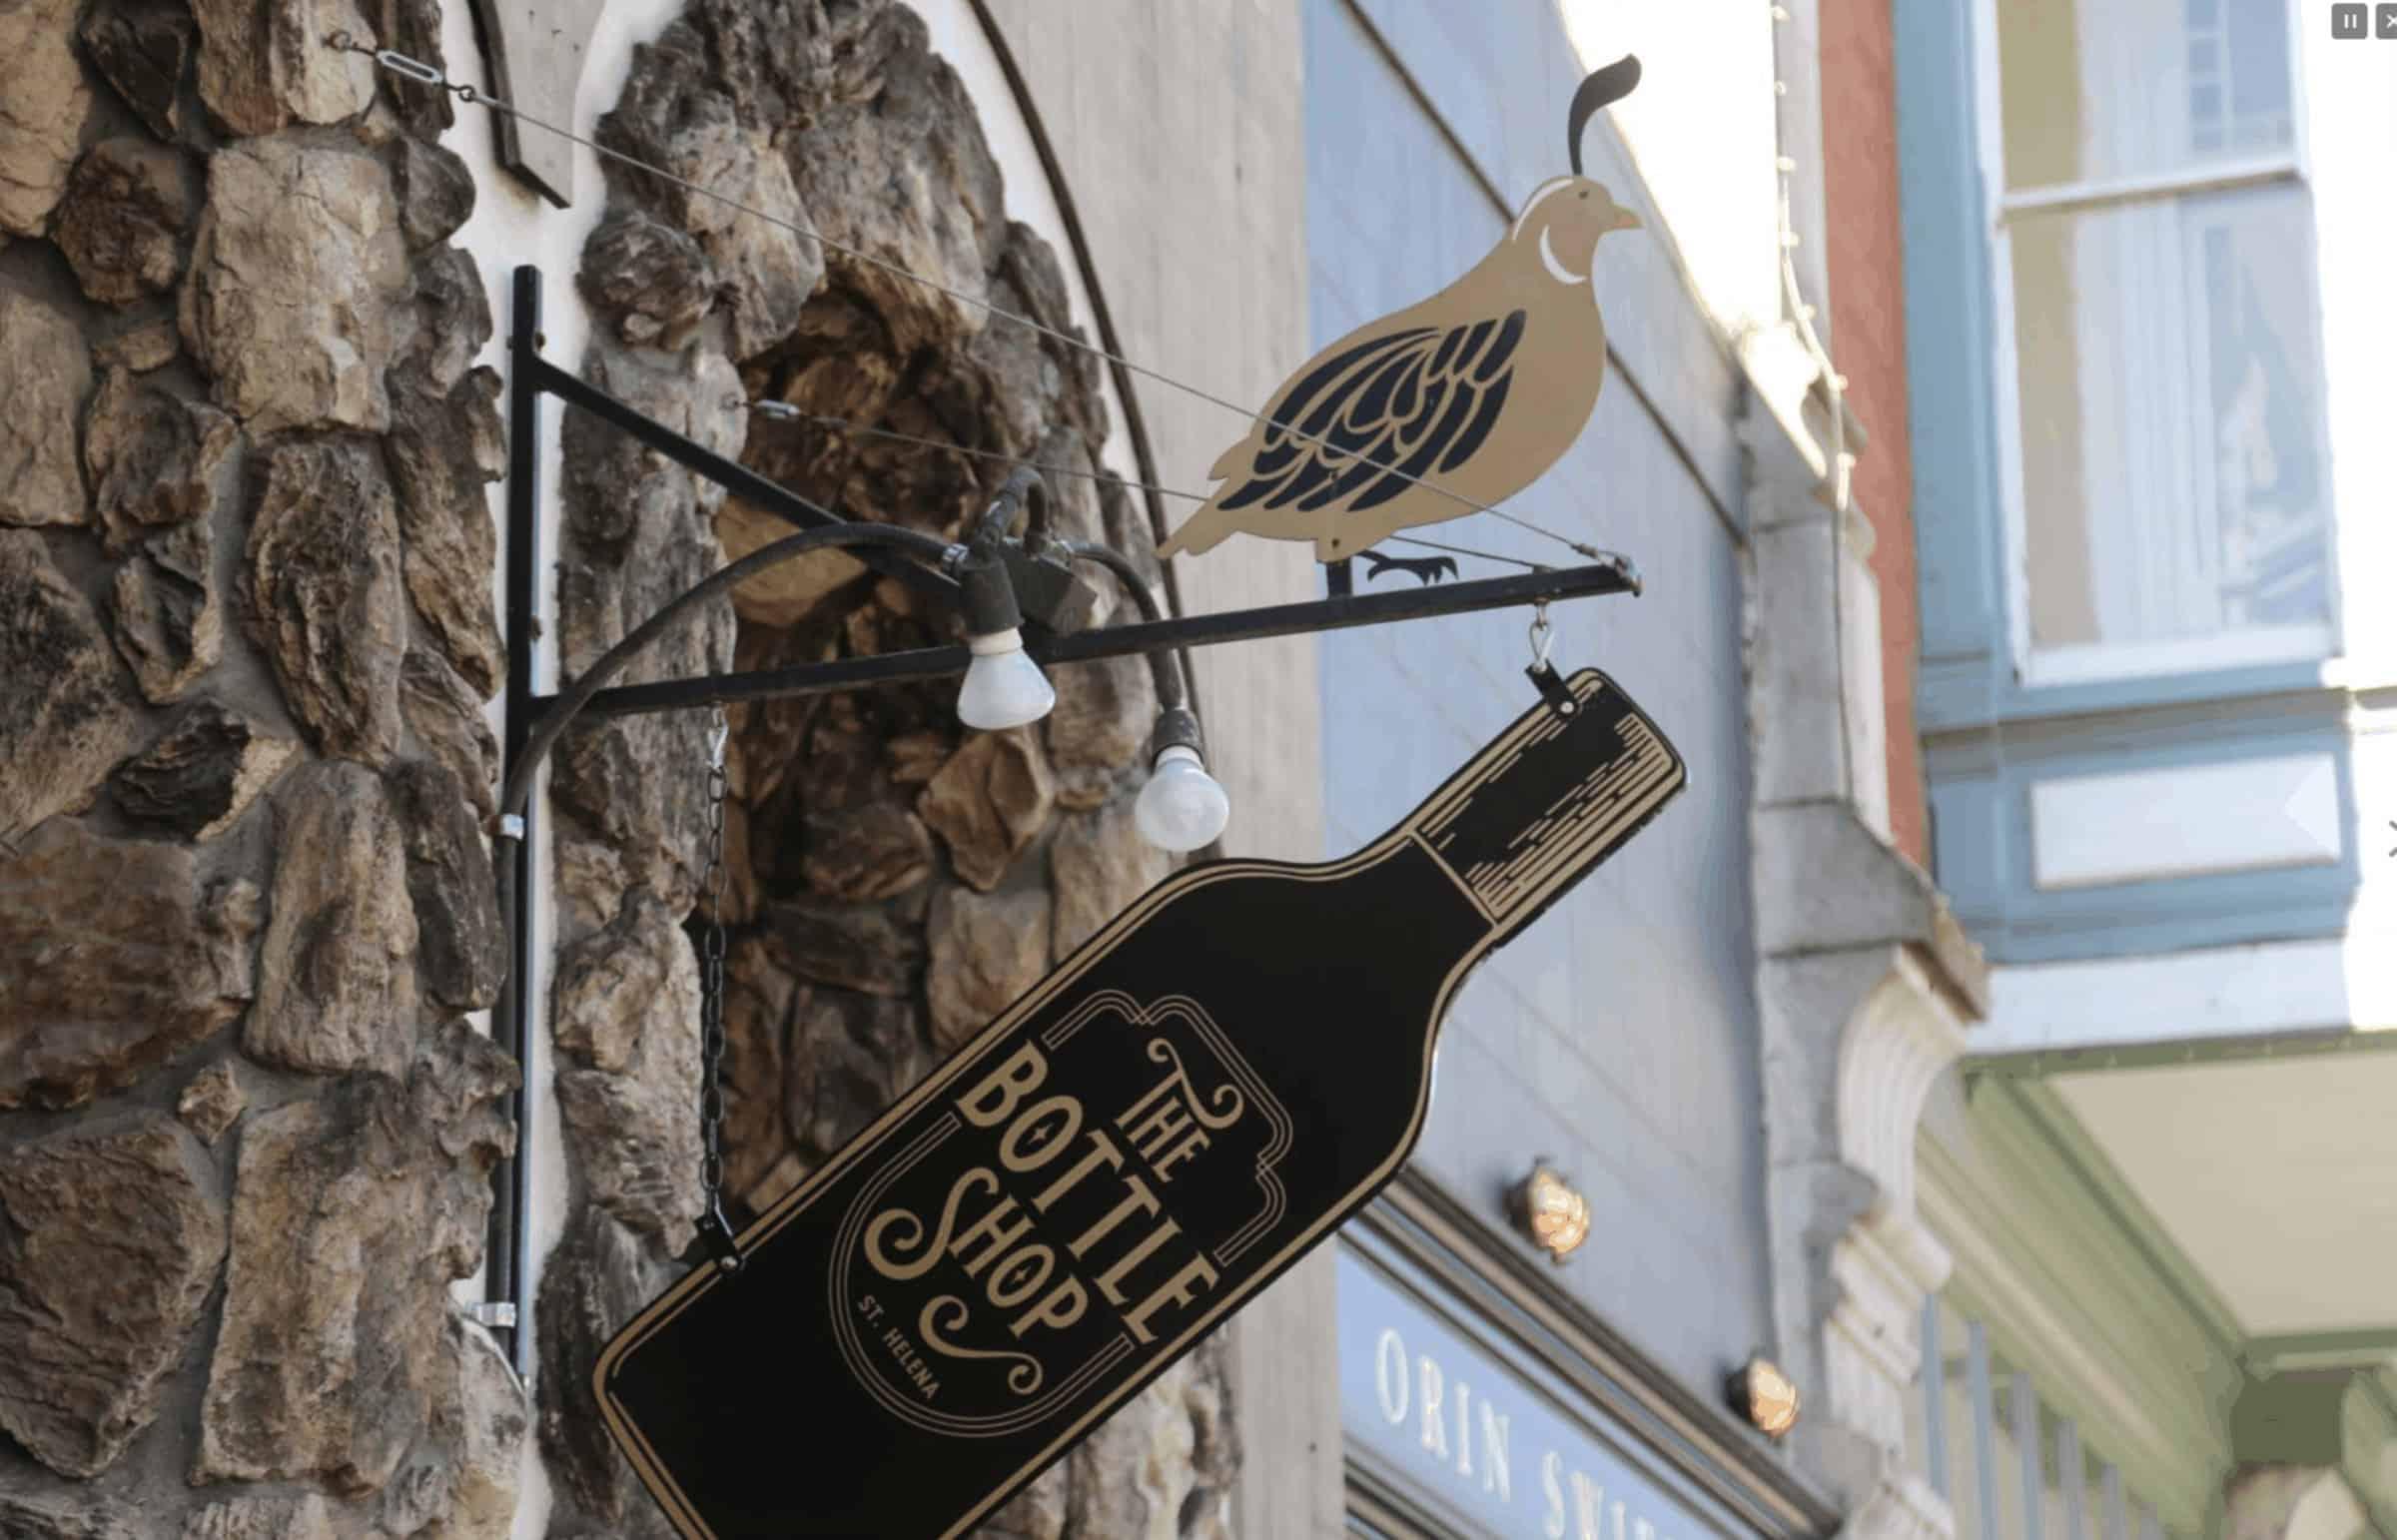 The Bottle Shop St. Helena